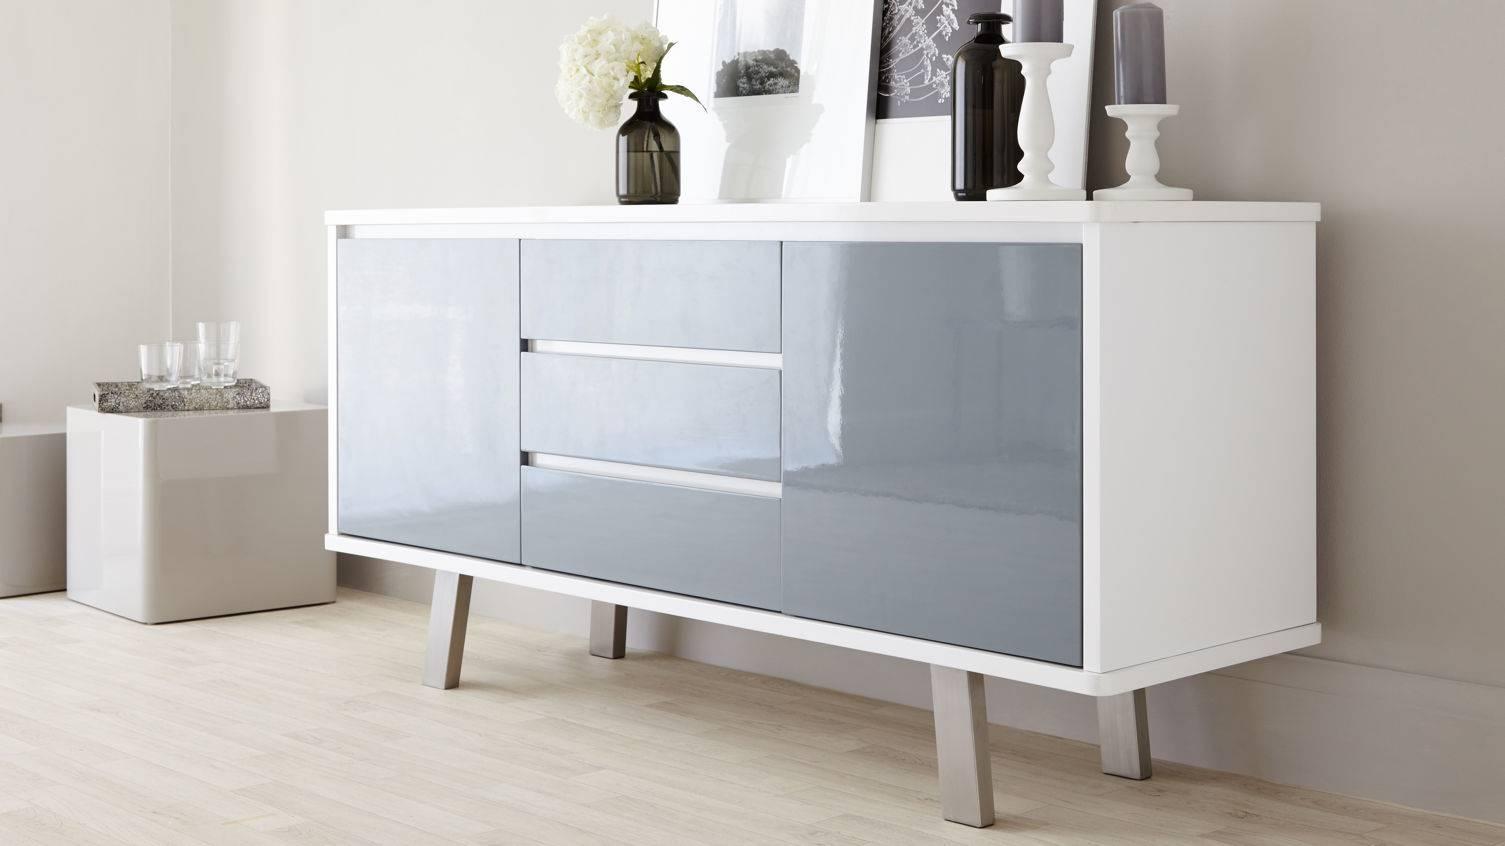 Furniture: Mid Century Modern Sideboard For Inspiring Interior Regarding Sideboard White Wood (View 8 of 20)